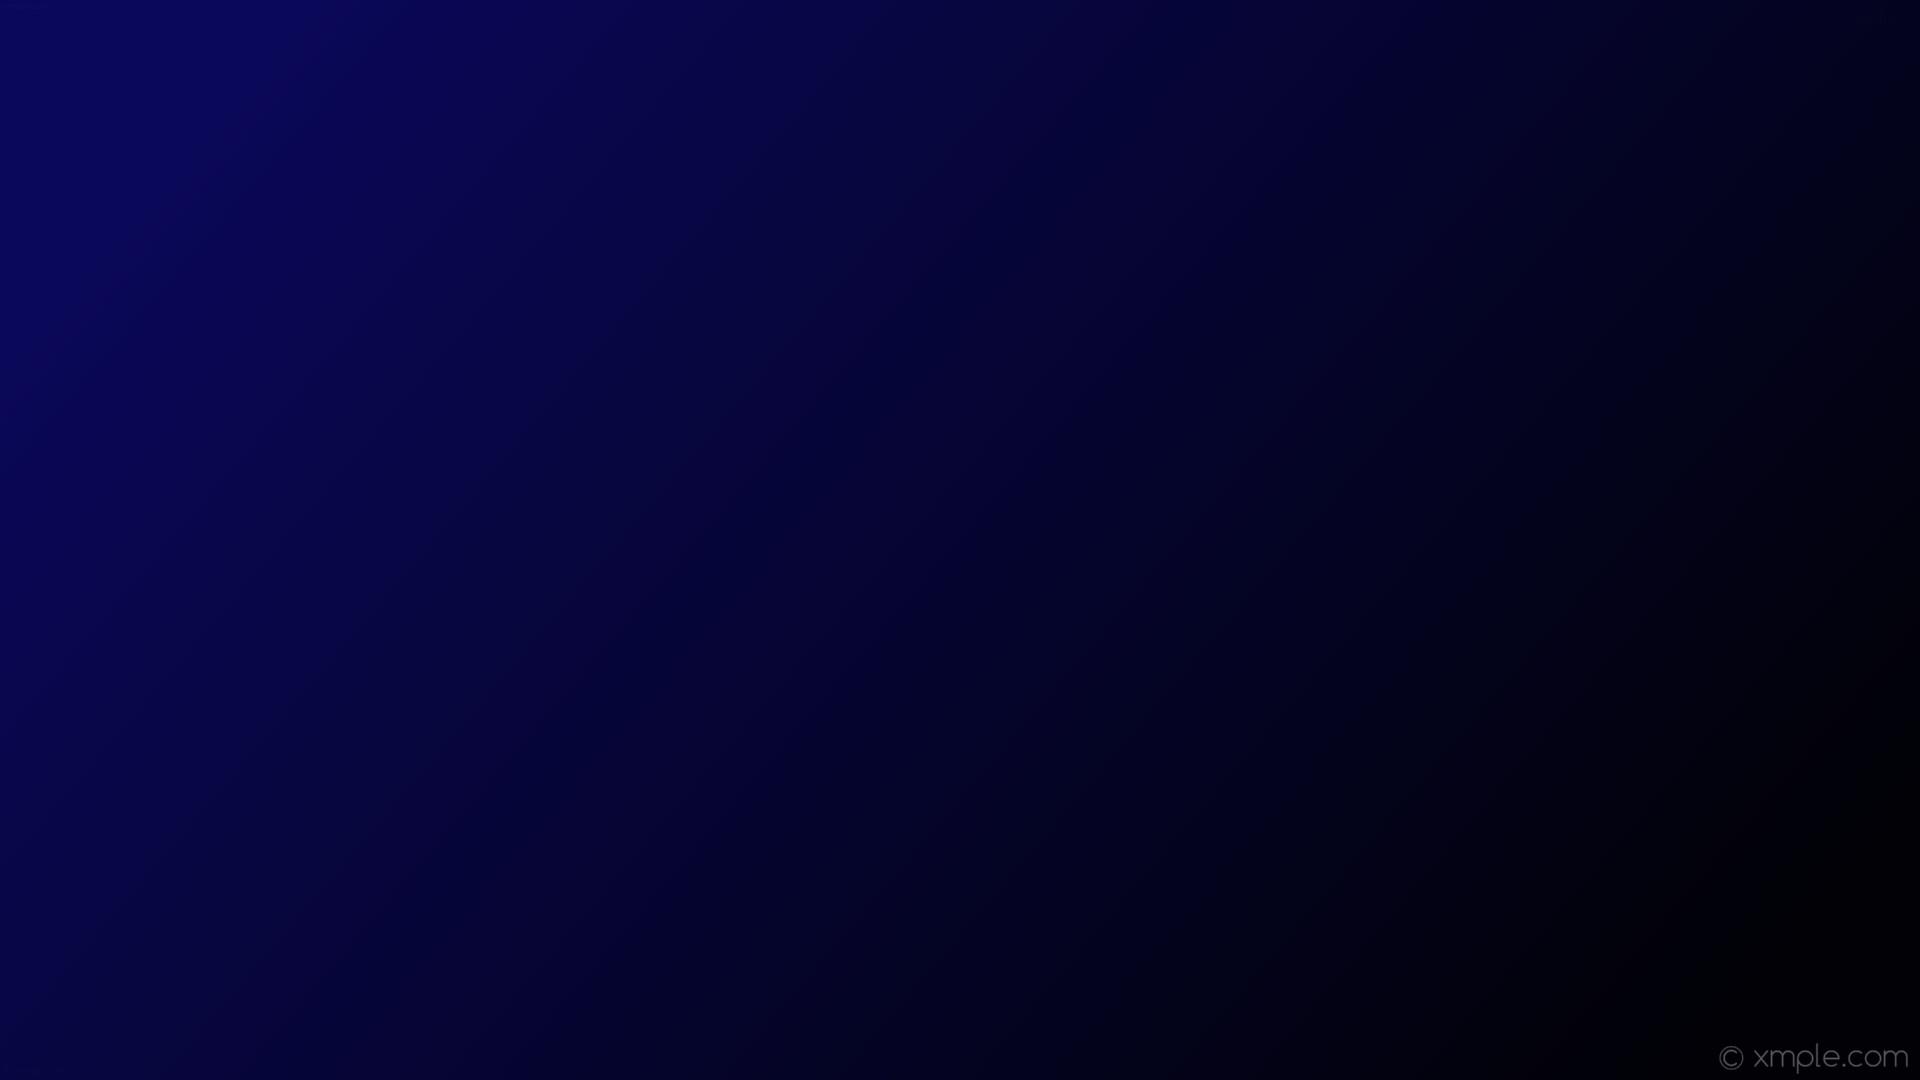 wallpaper black linear blue gradient dark blue #0a085b #010106 165°